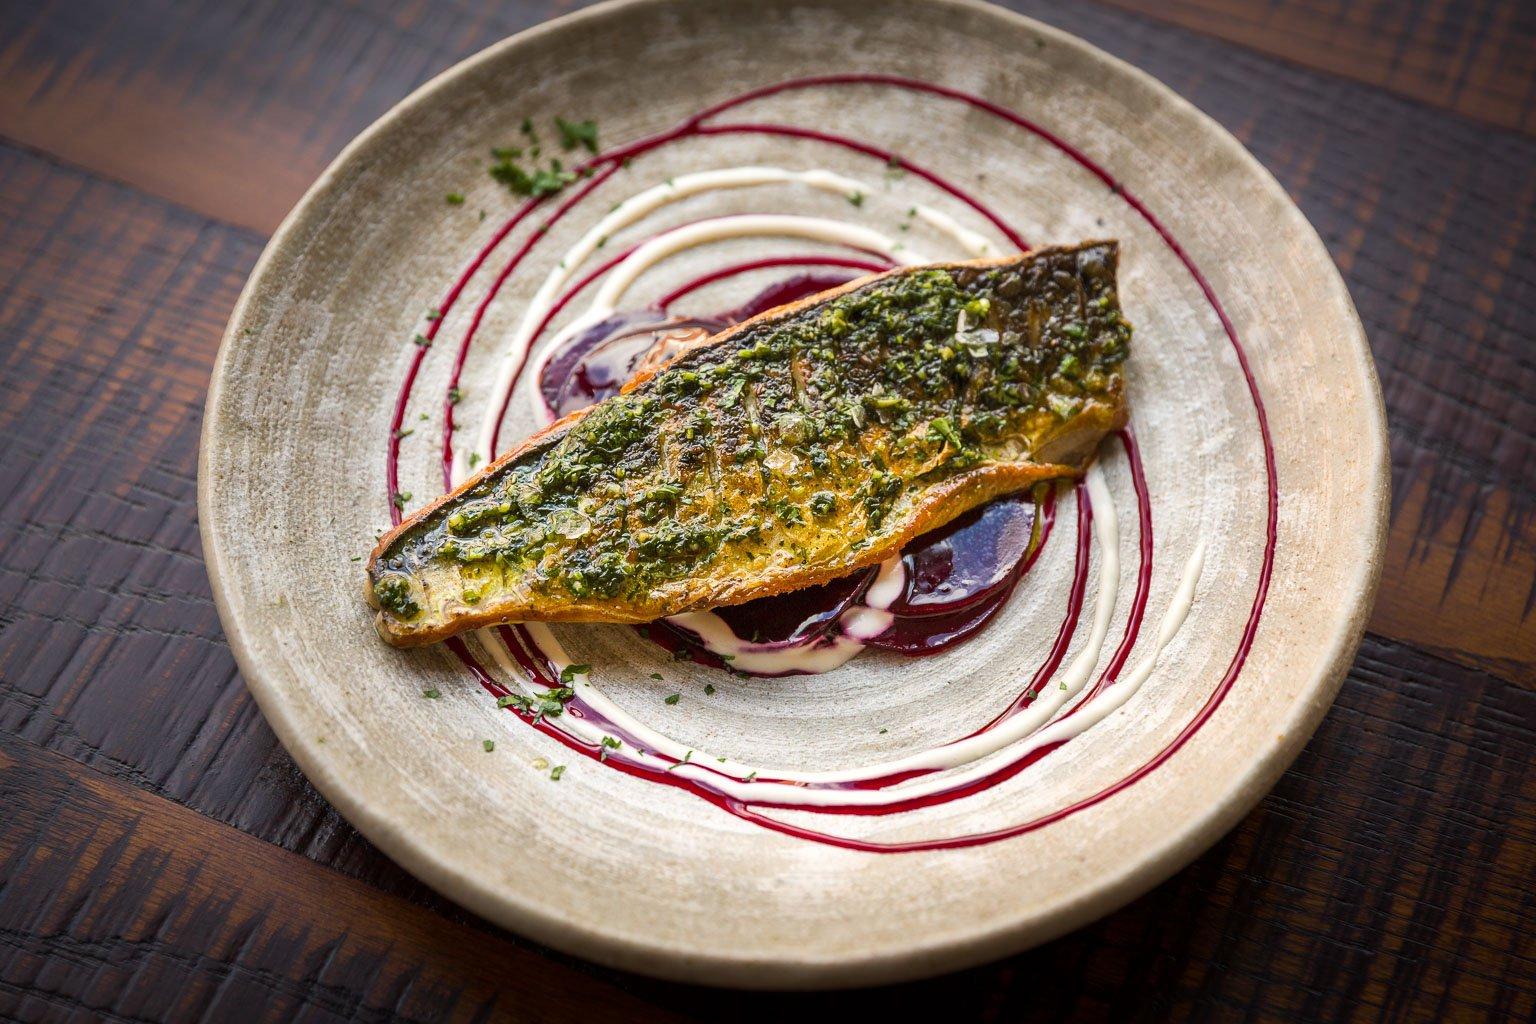 Grilled mackerel fillet with beetroot salad, horseradish dressing